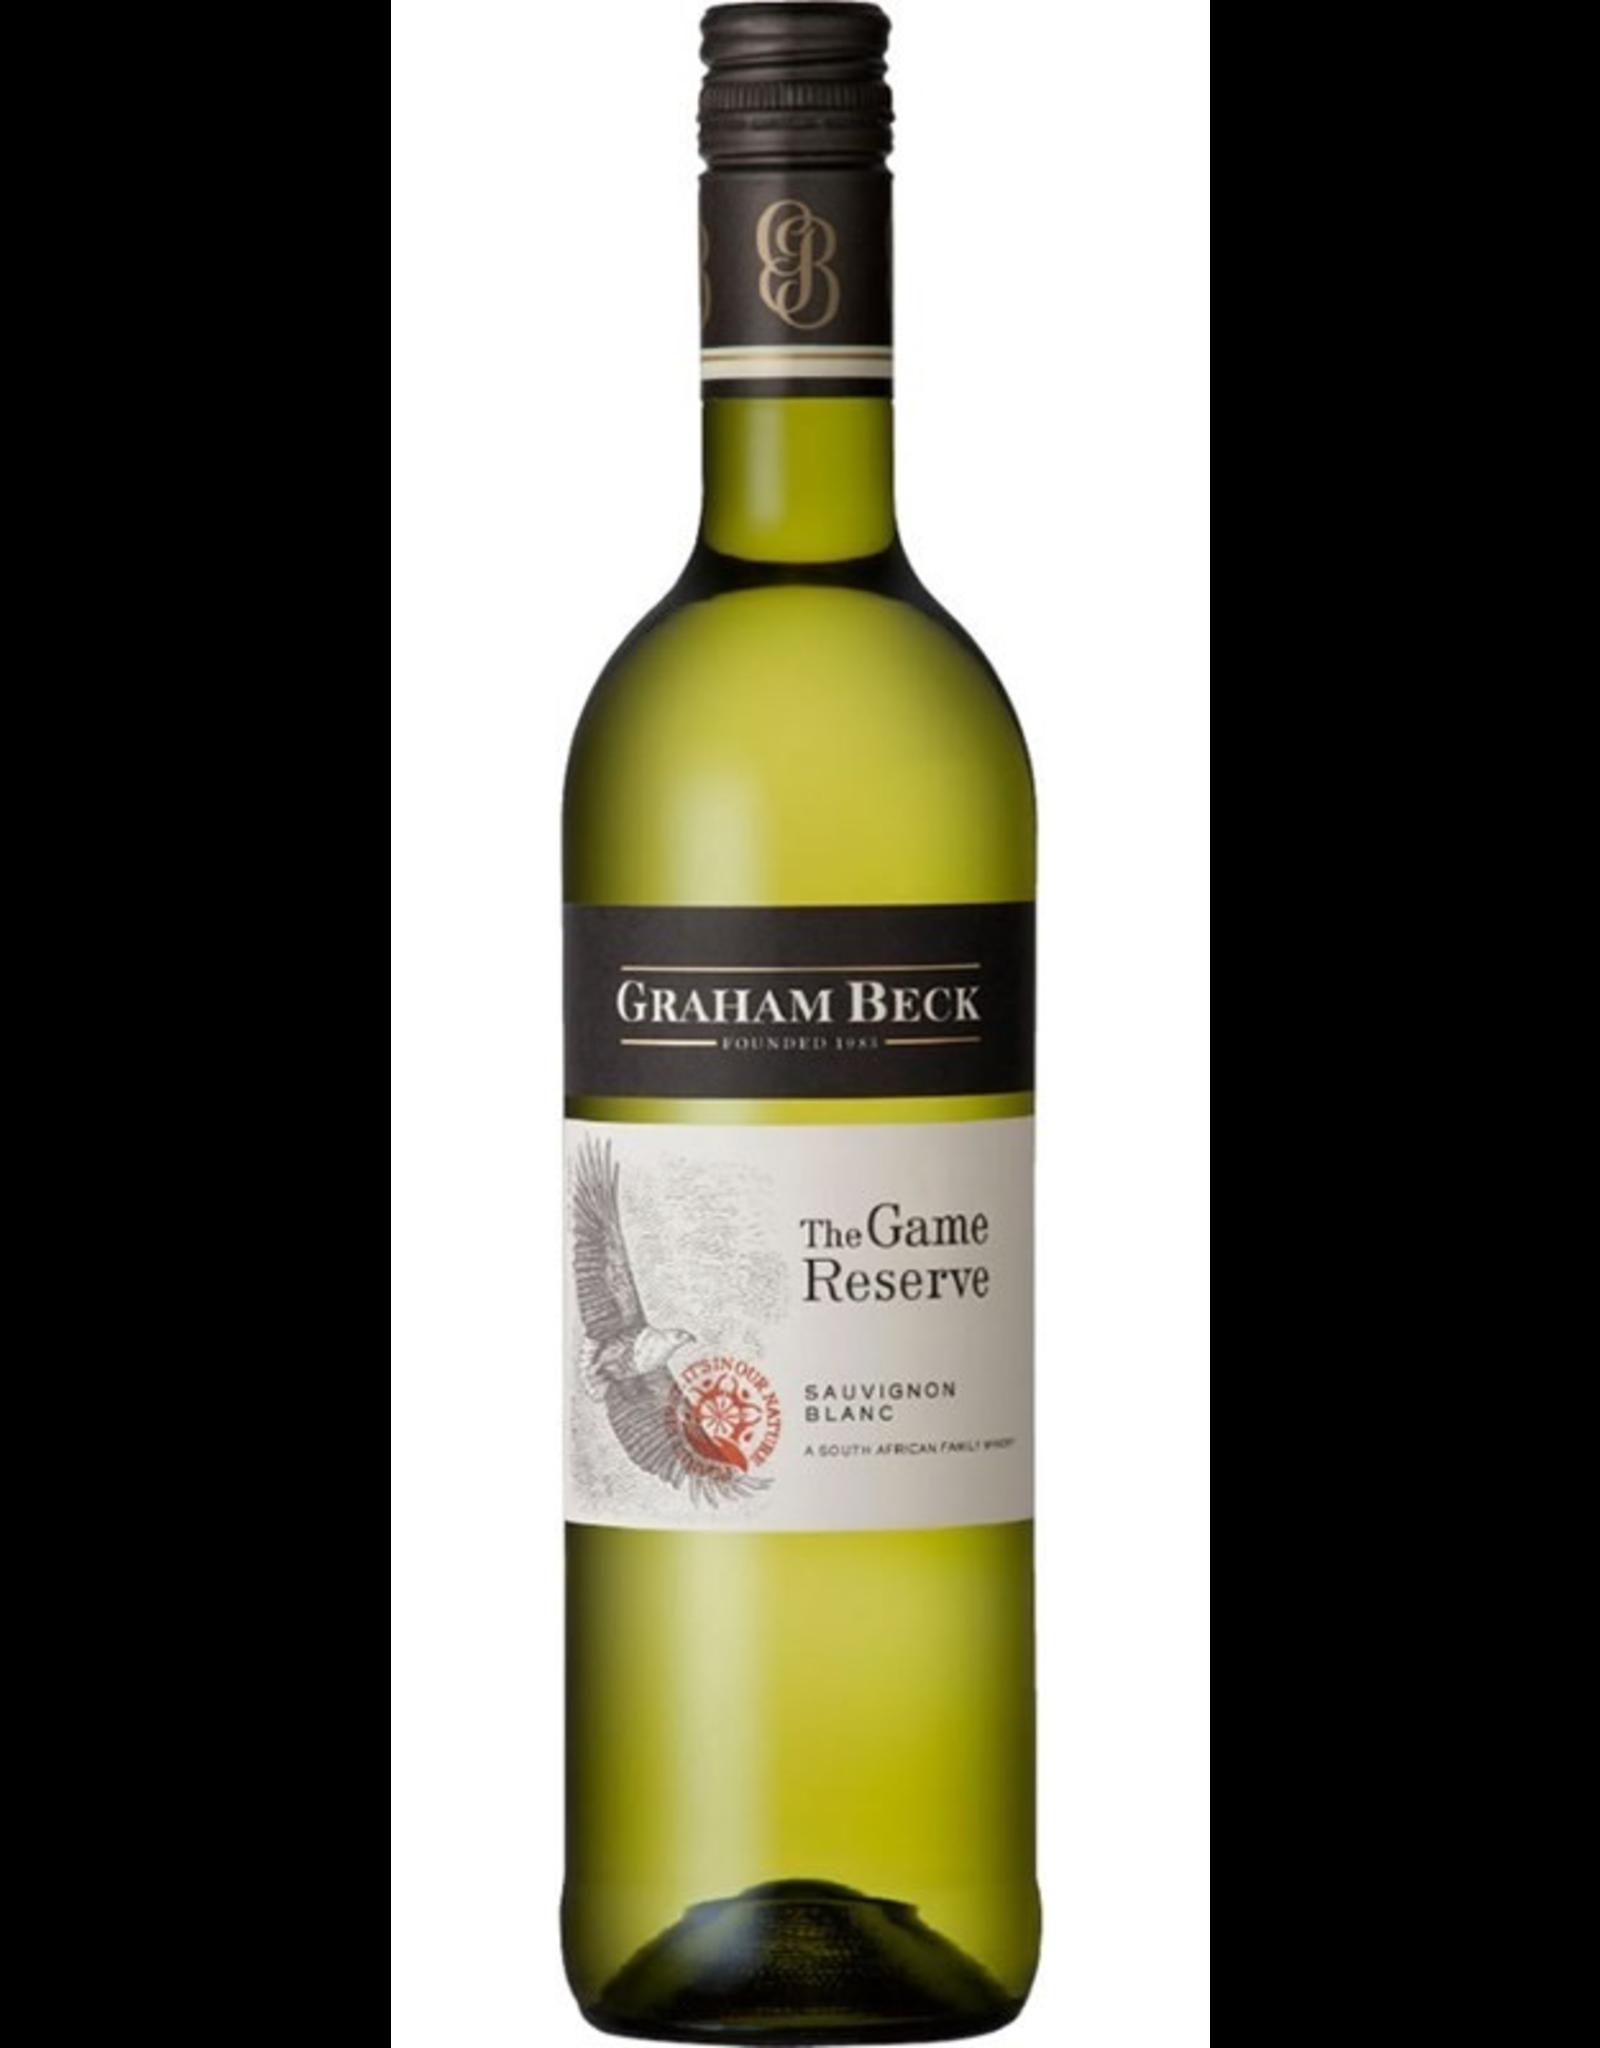 White Wine 2014, Graham Beck Game Reserve, Sauvignon Blanc, Robertson, Coastal Region, South Africa, 13.5% Alc, CT85